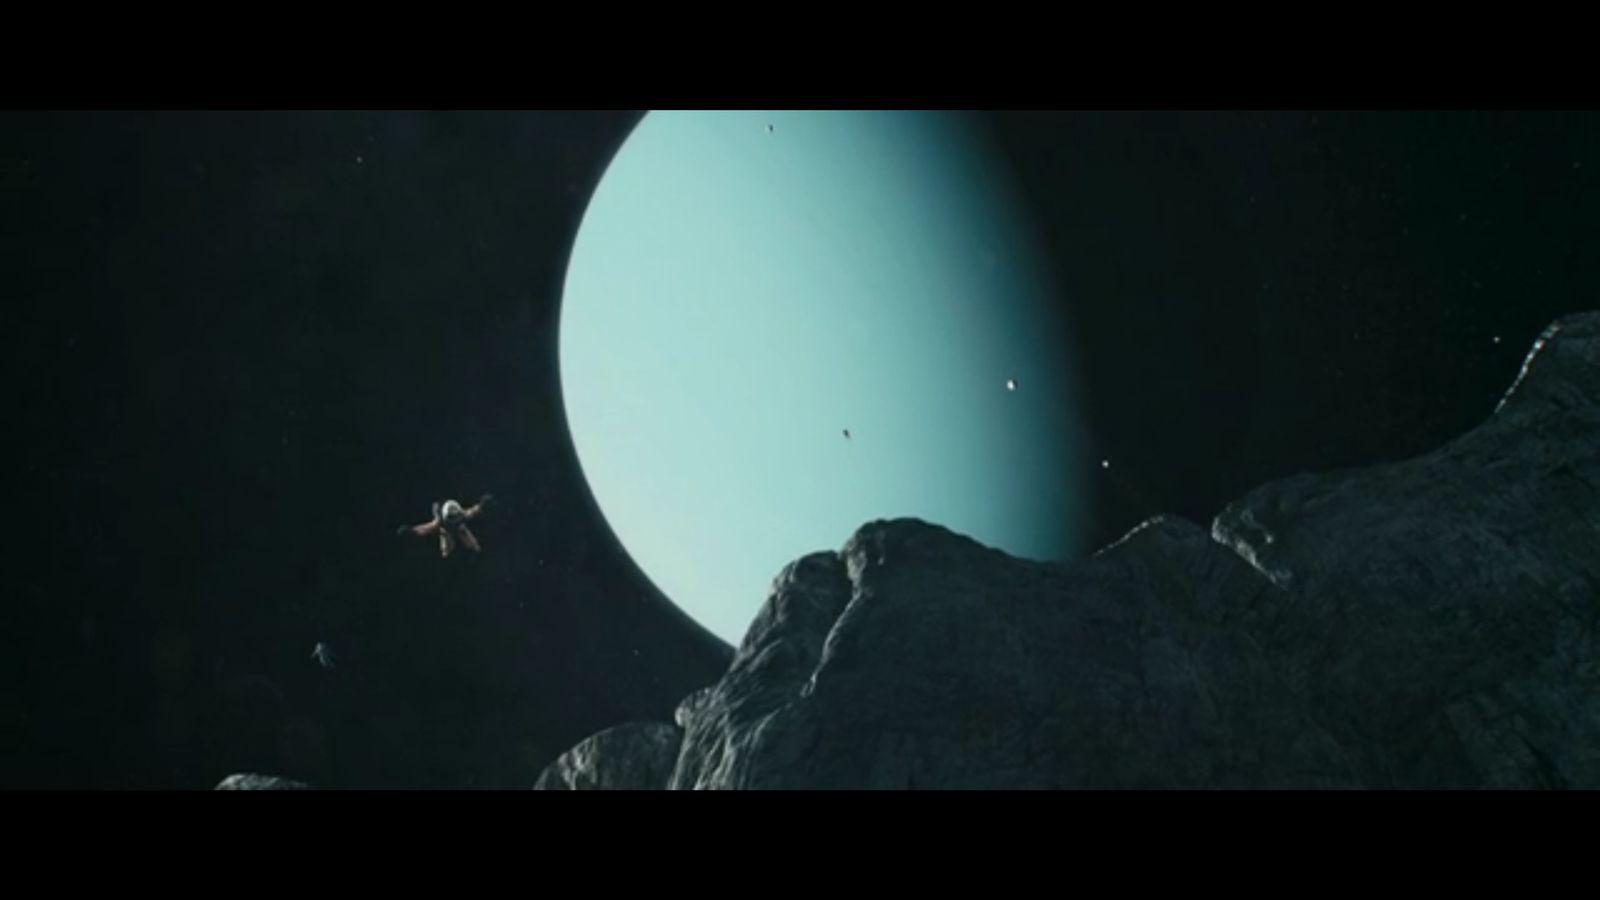 NUR ALS ZITAT Screenshot Kurzfilm/ Wanderers/ Erik Wernquist